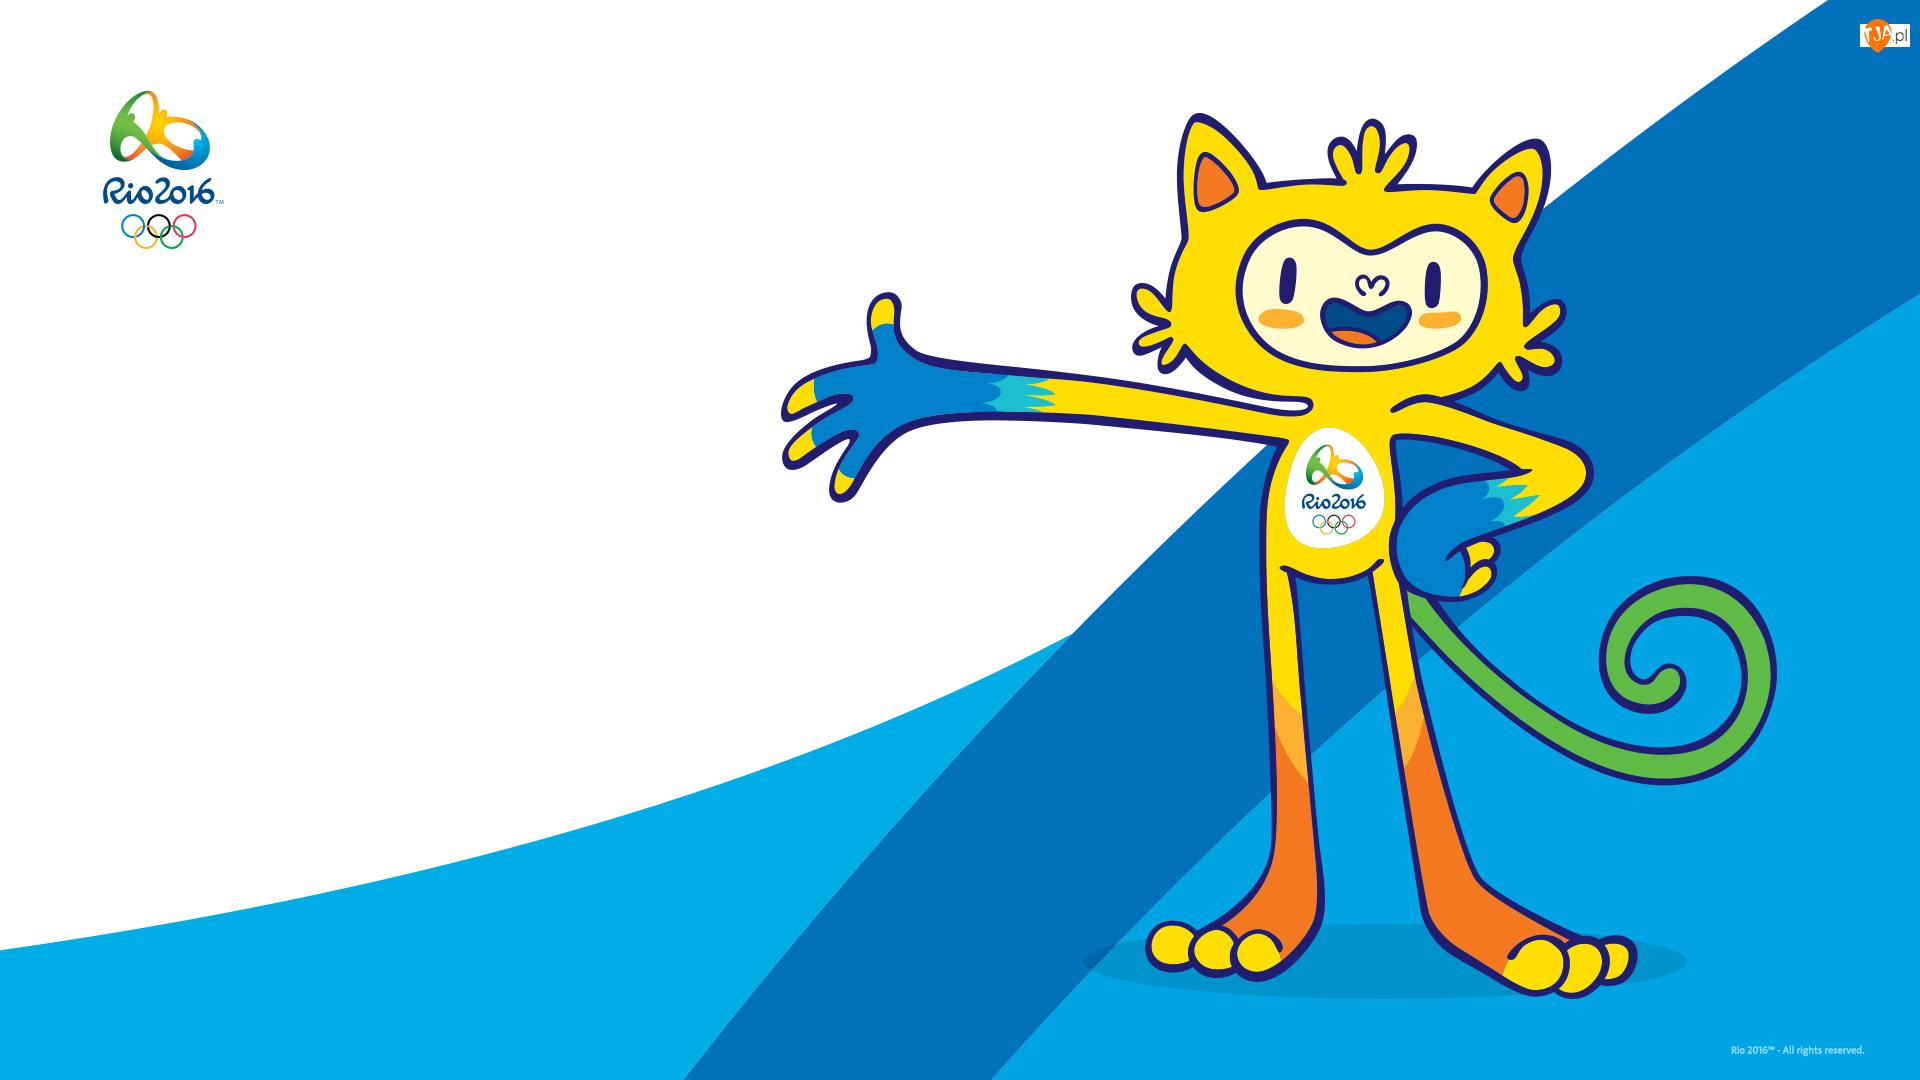 Olimpiada Rio 2016, Rio de Janeiro, Igrzyska Paraolimpijskie 2016, Letnie Igrzyska Paraolimpijskie